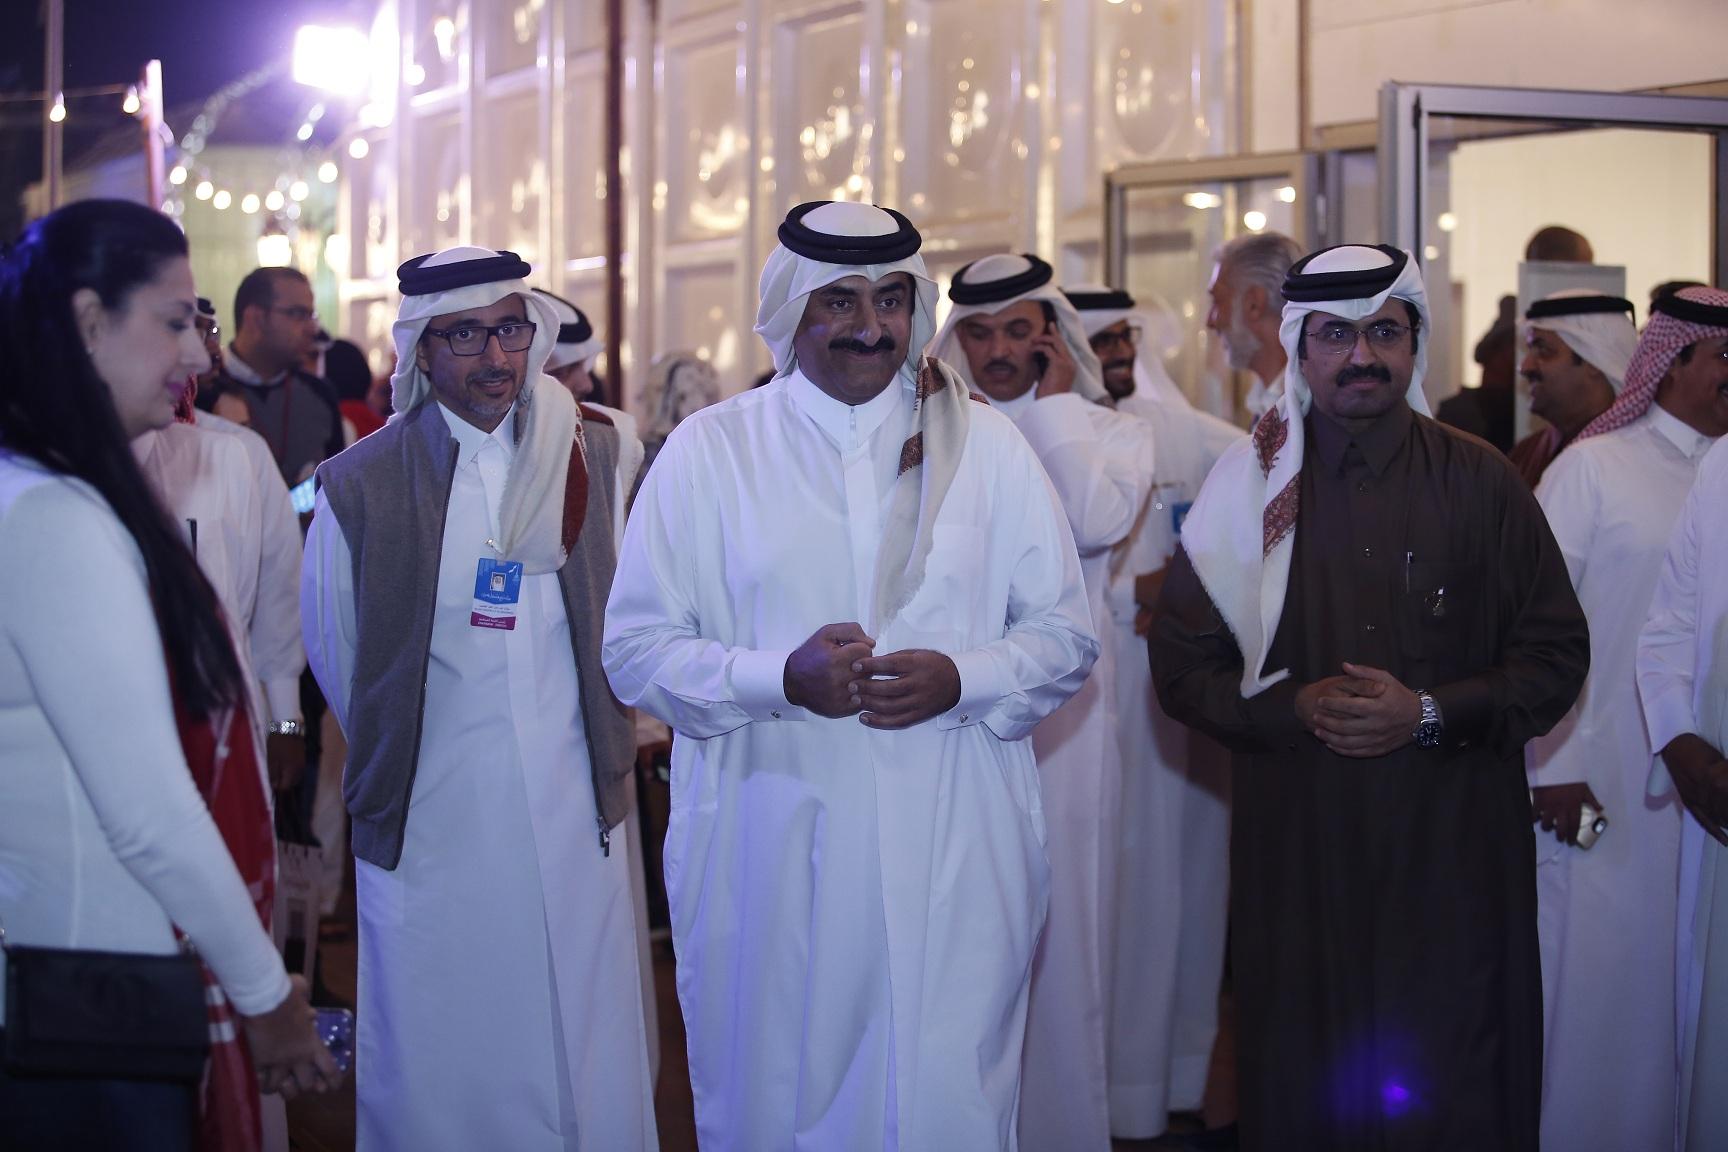 QND 2015 Ministers 2.JPG